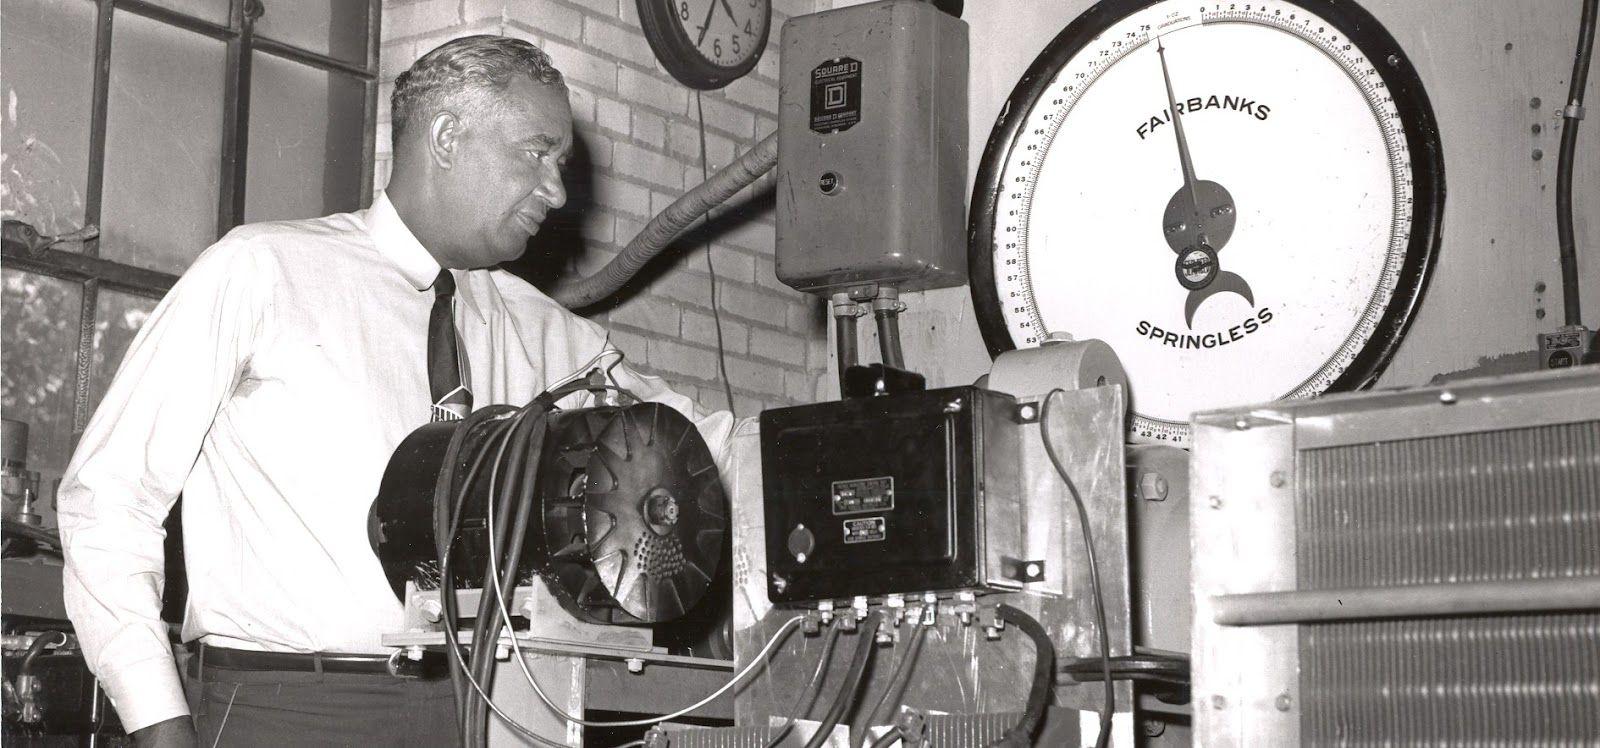 frederick m. jones: air condition unit 1949 | i am black